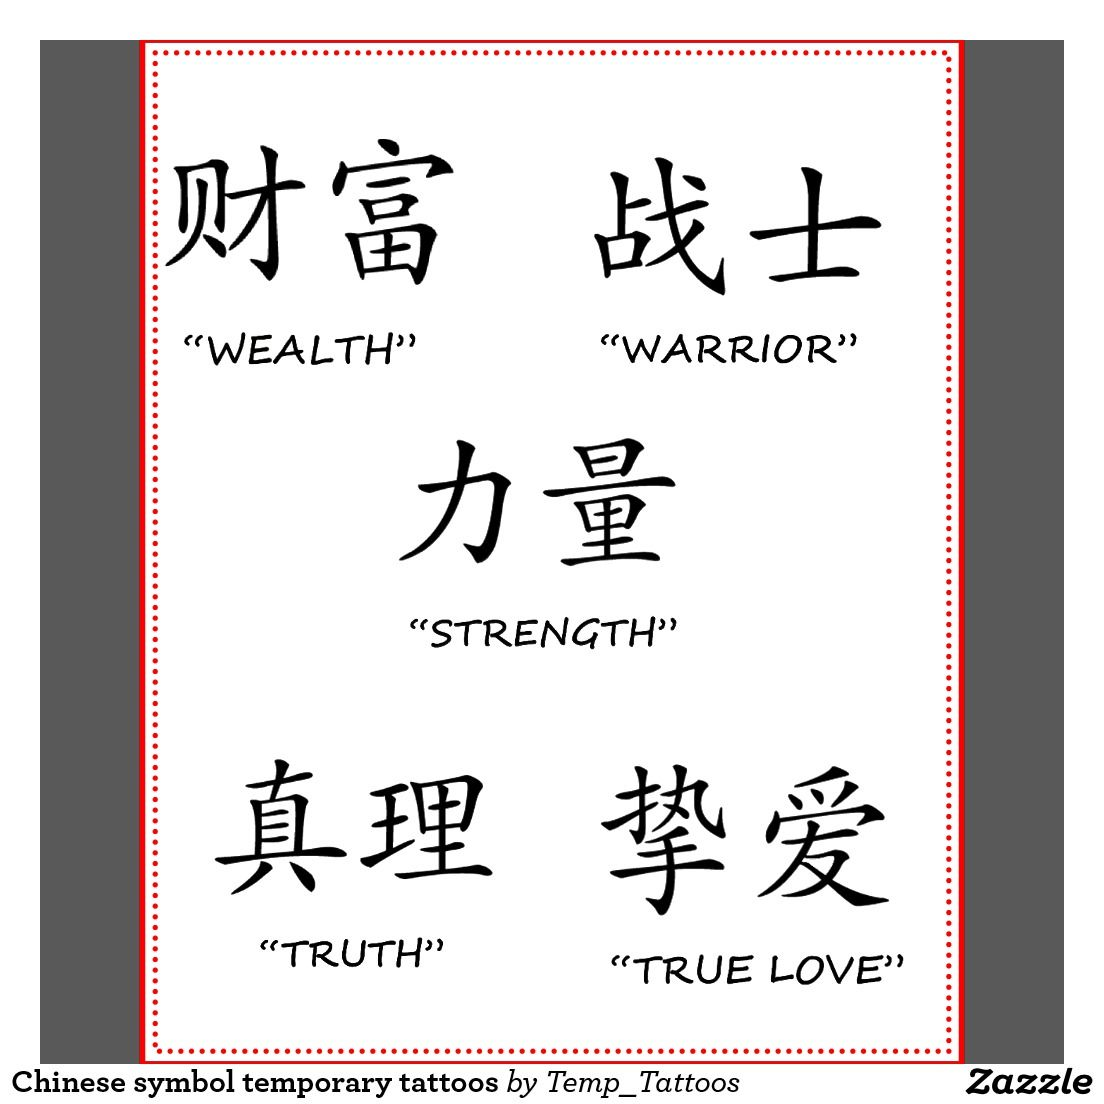 Chinese symbols relevant google search mzabvbf medusaz army chinese symbols relevant google search biocorpaavc Choice Image